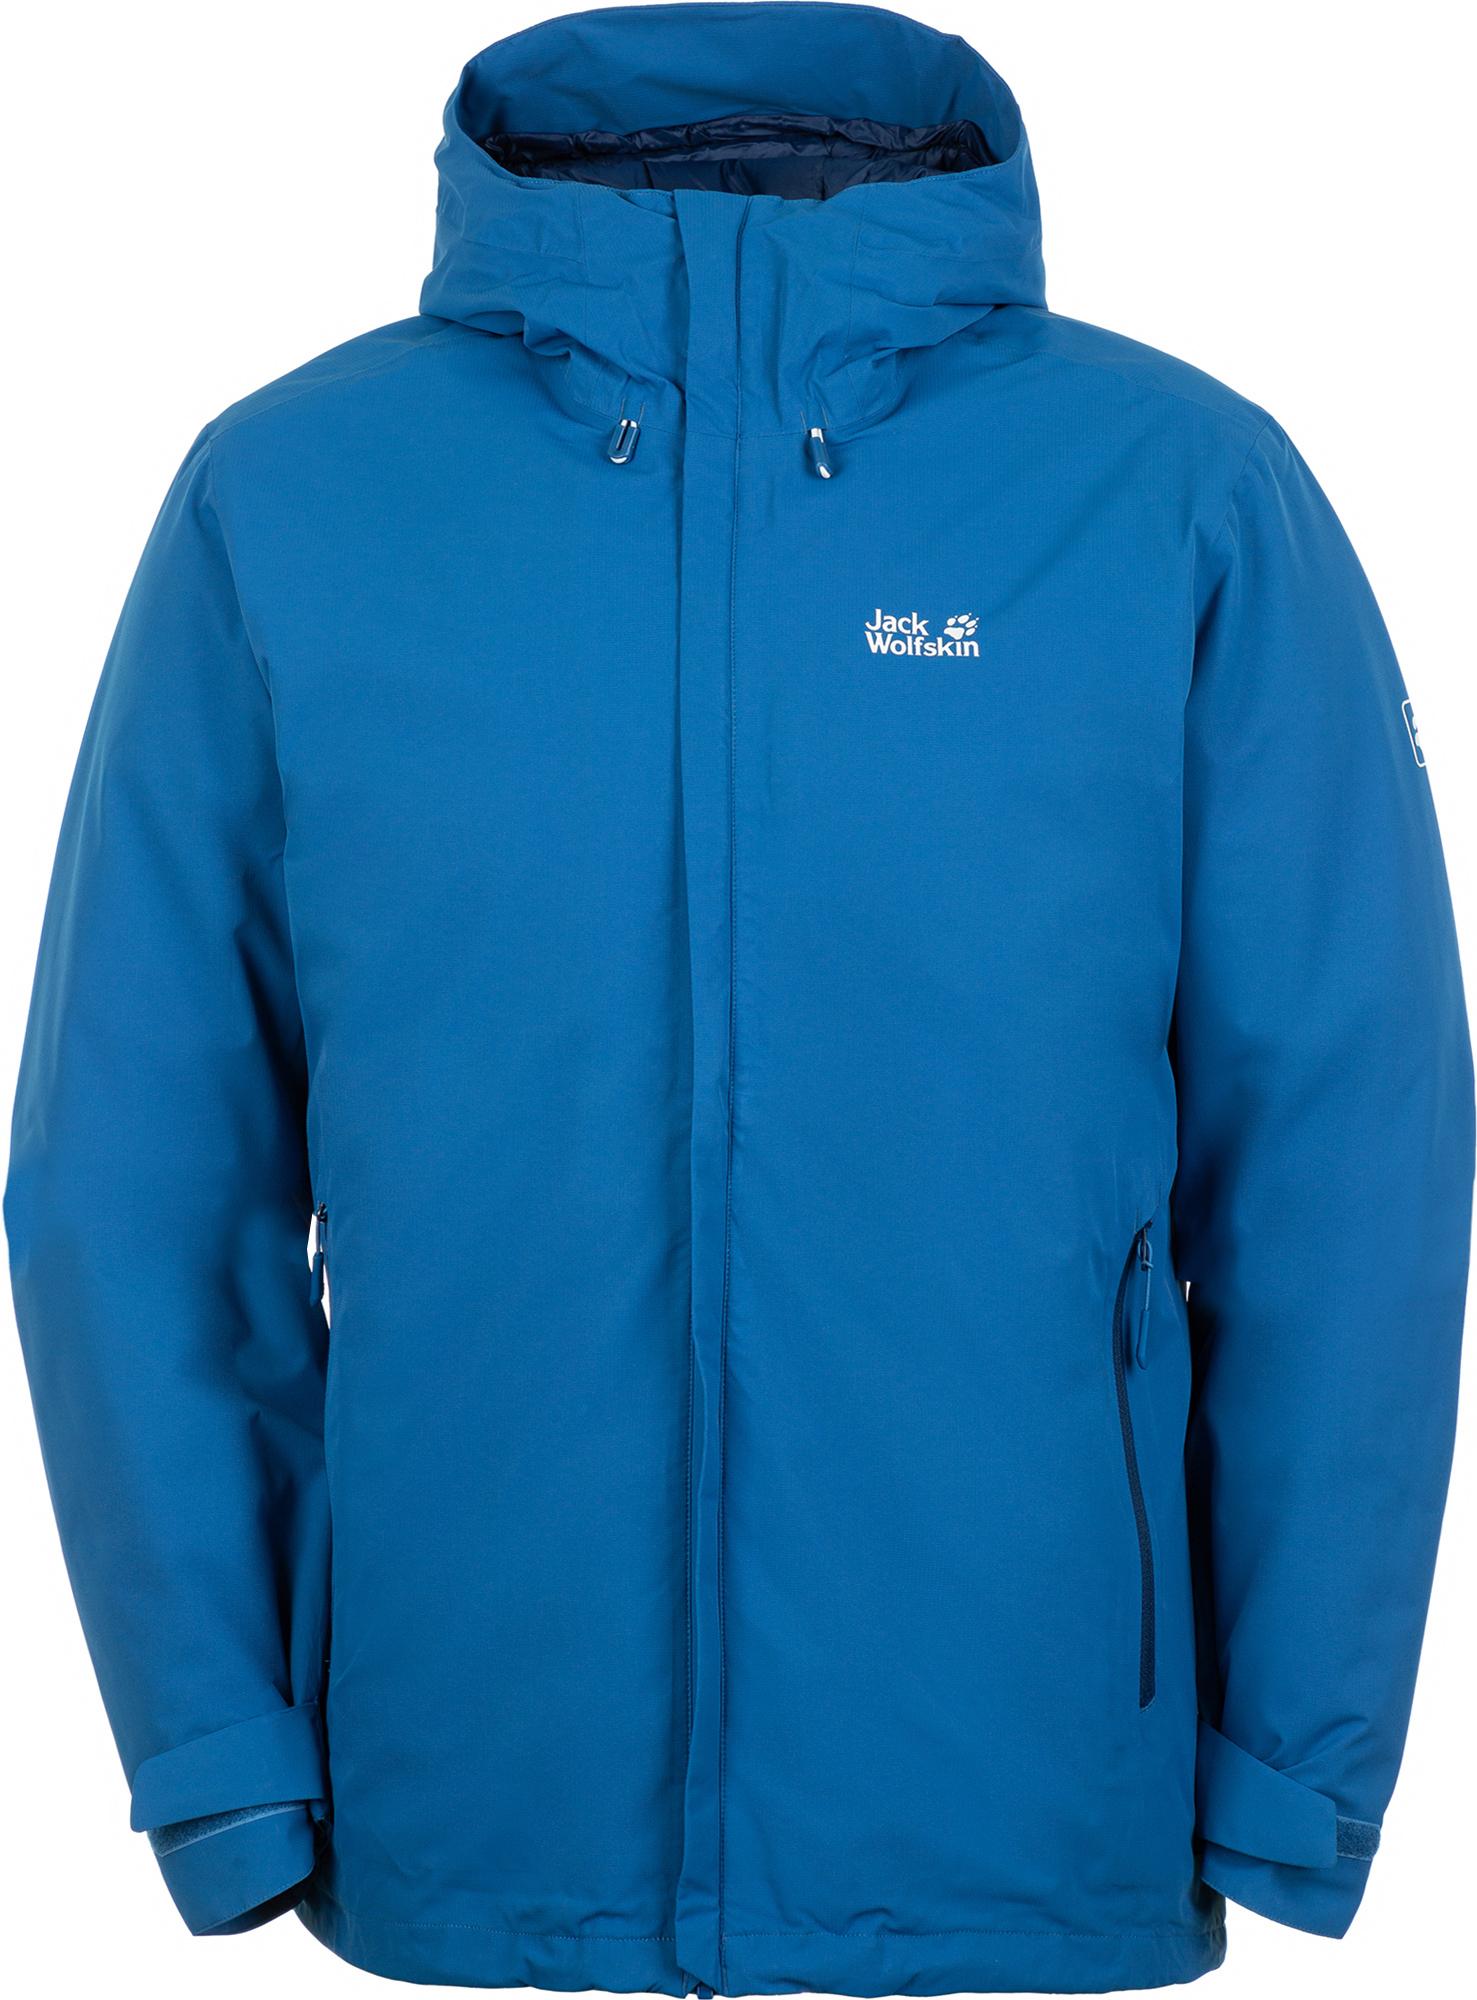 Jack Wolfskin Куртка утепленная мужская Argon Storm, размер 54-56